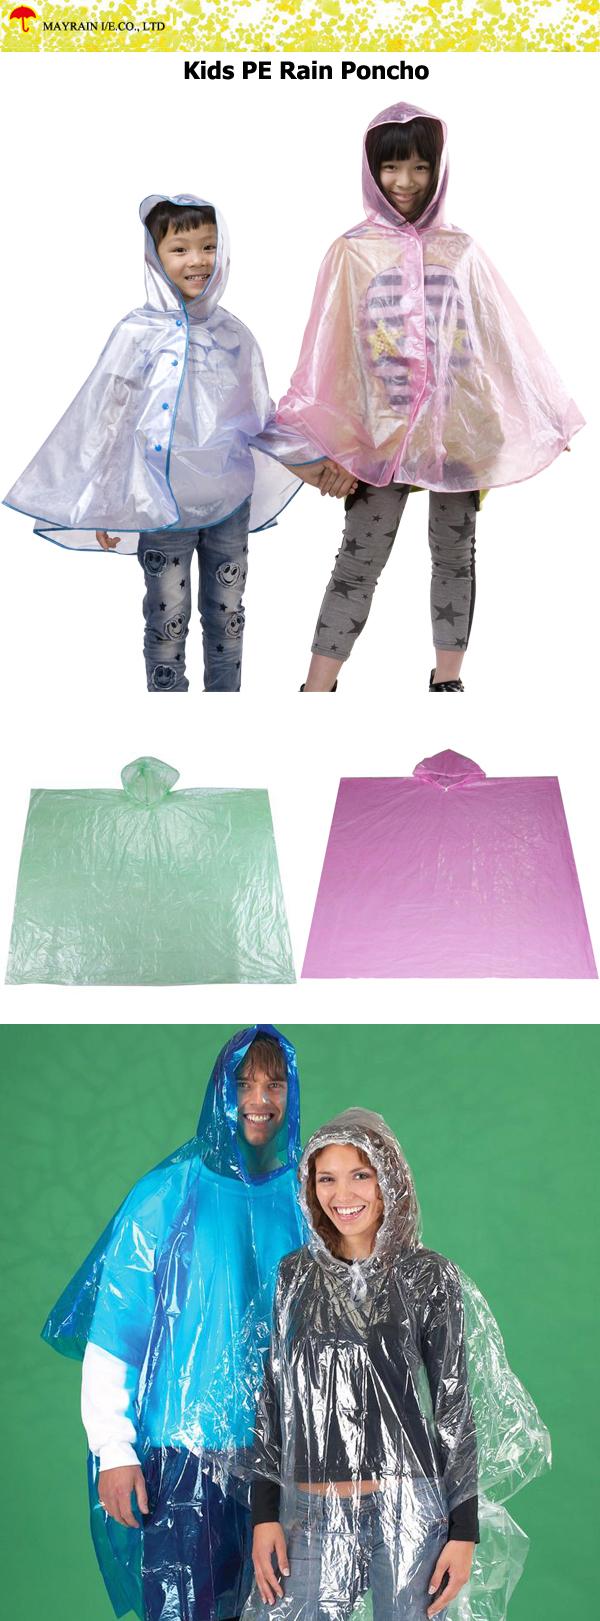 Kids PE Rain Poncho